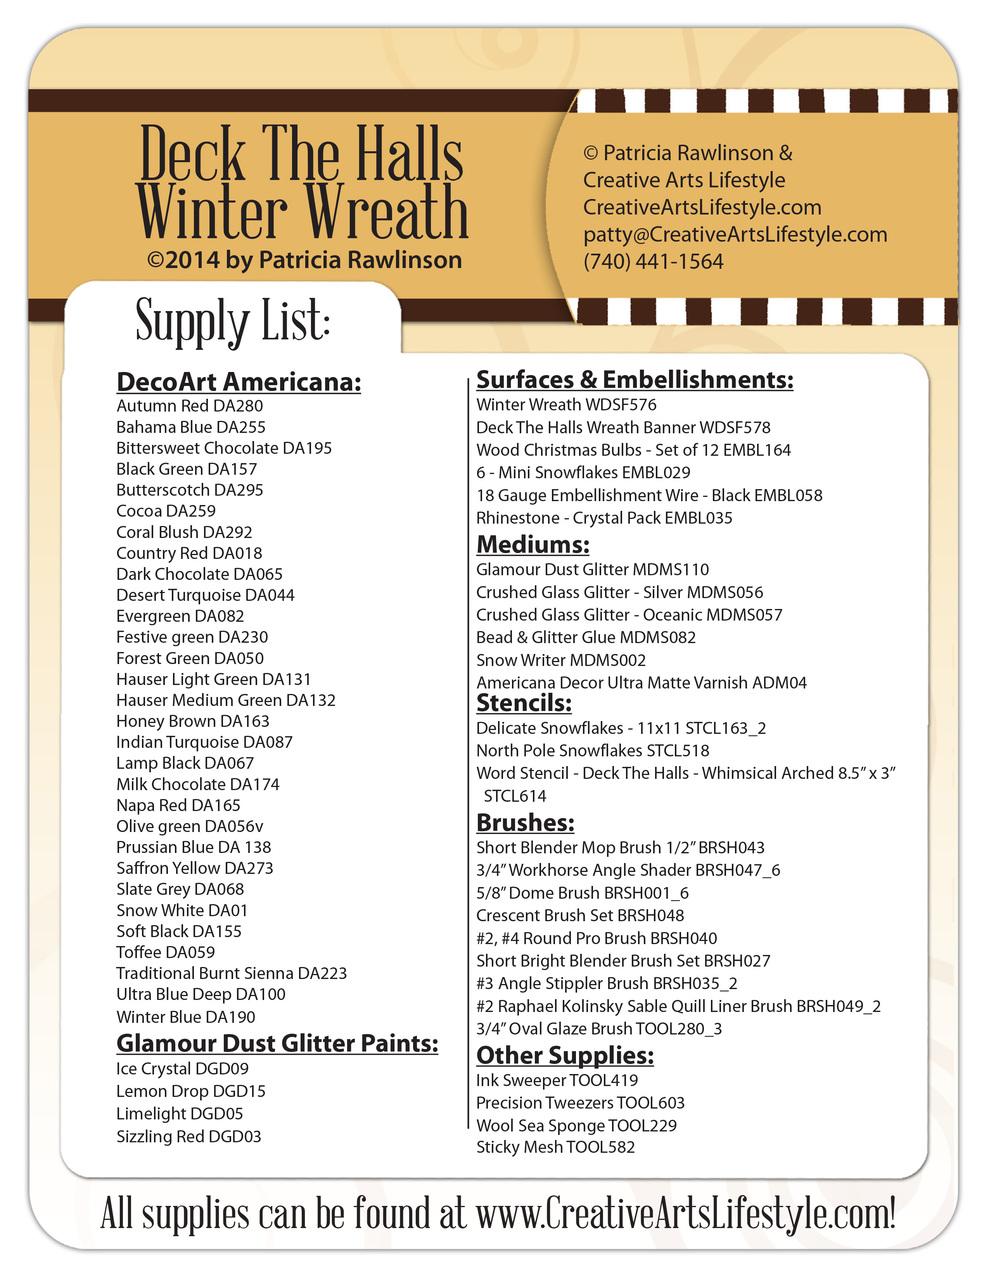 Deck the Halls Winter Wreath E-Packet - Patricia Rawlinson